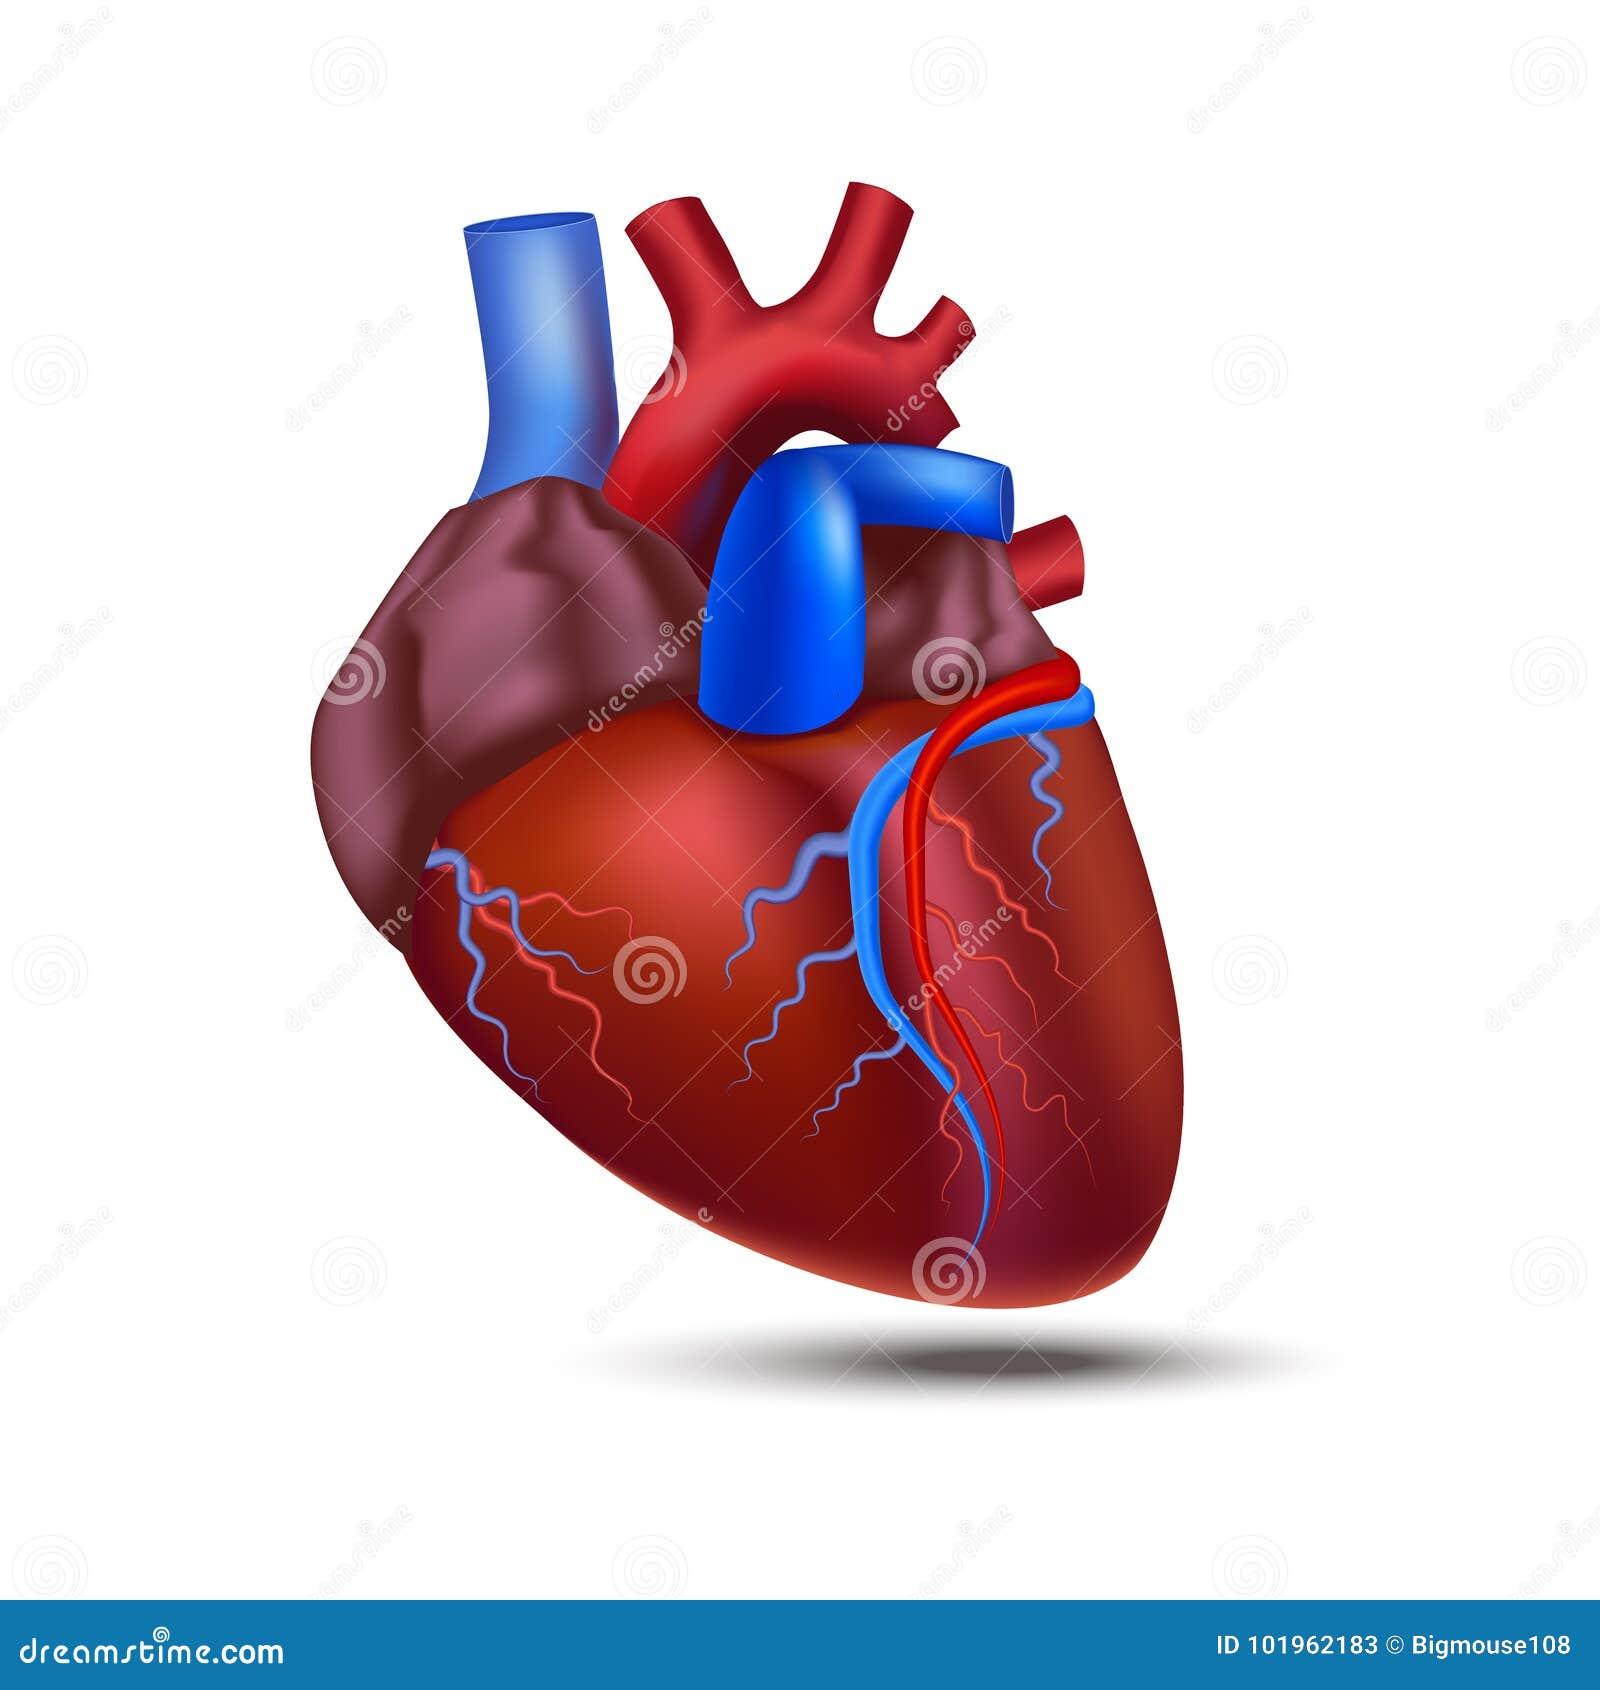 Realistic Detailed 3d Human Anatomy Heart Vector Stock Vector